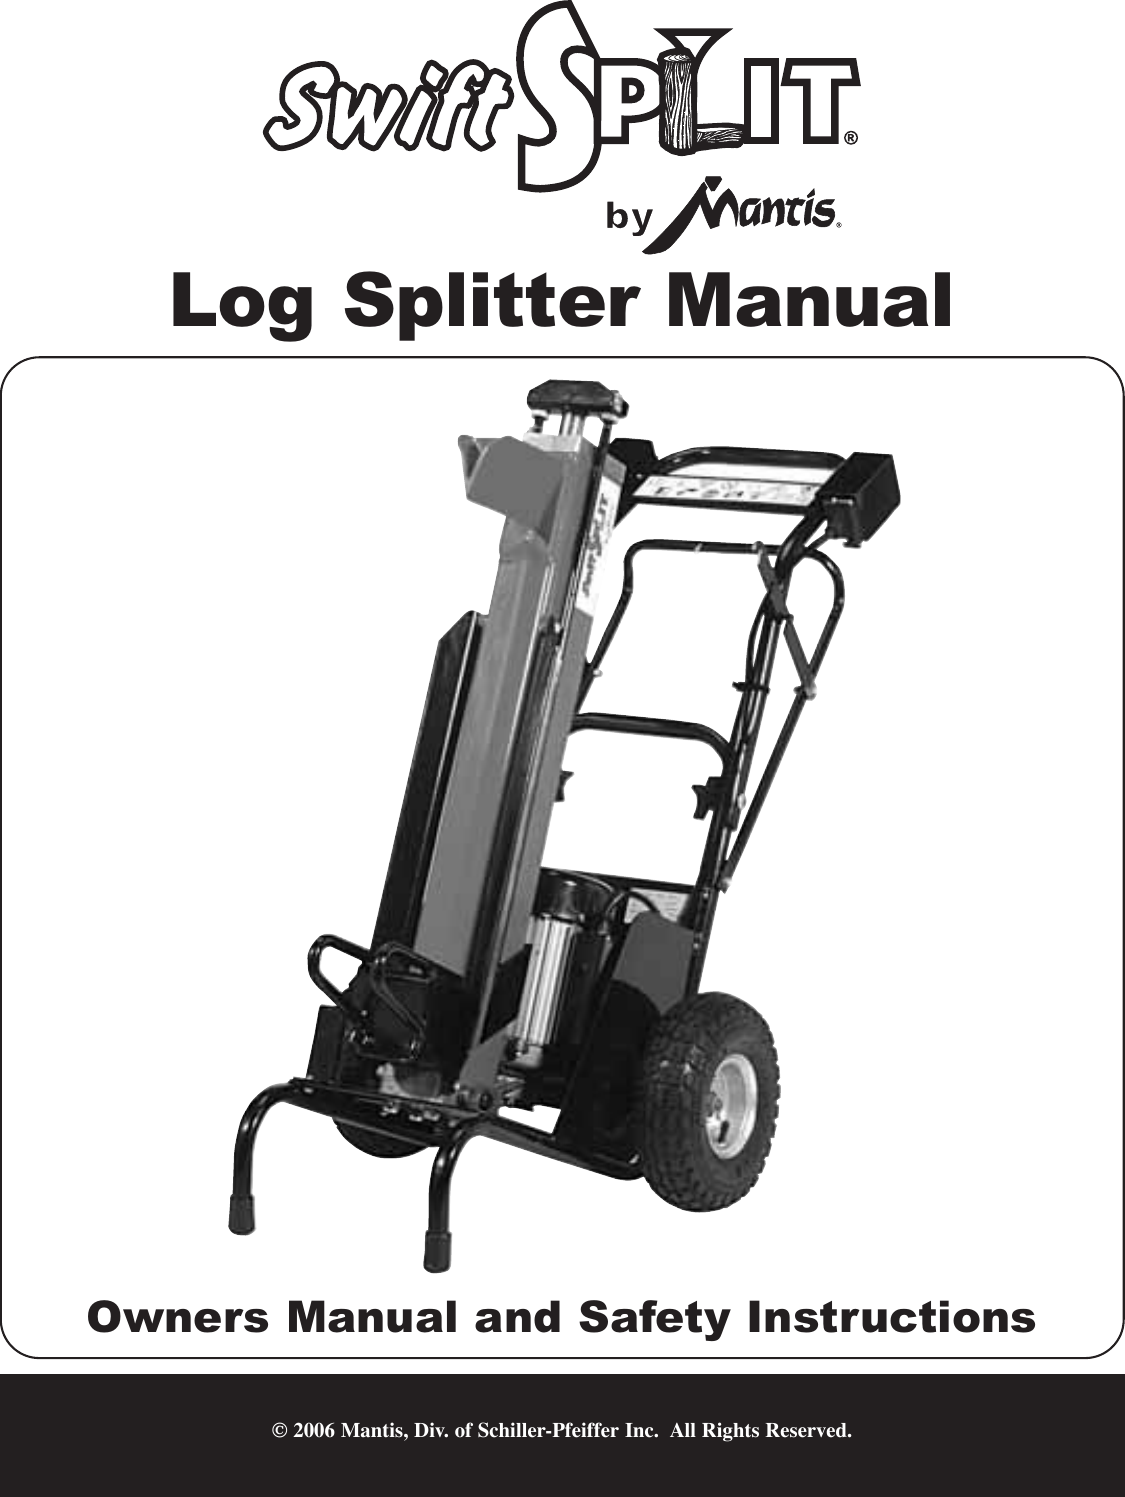 Little Wonder 5000 Users Manual 510700 Swift Split Log Splitter Solenoid Wiring Diagram